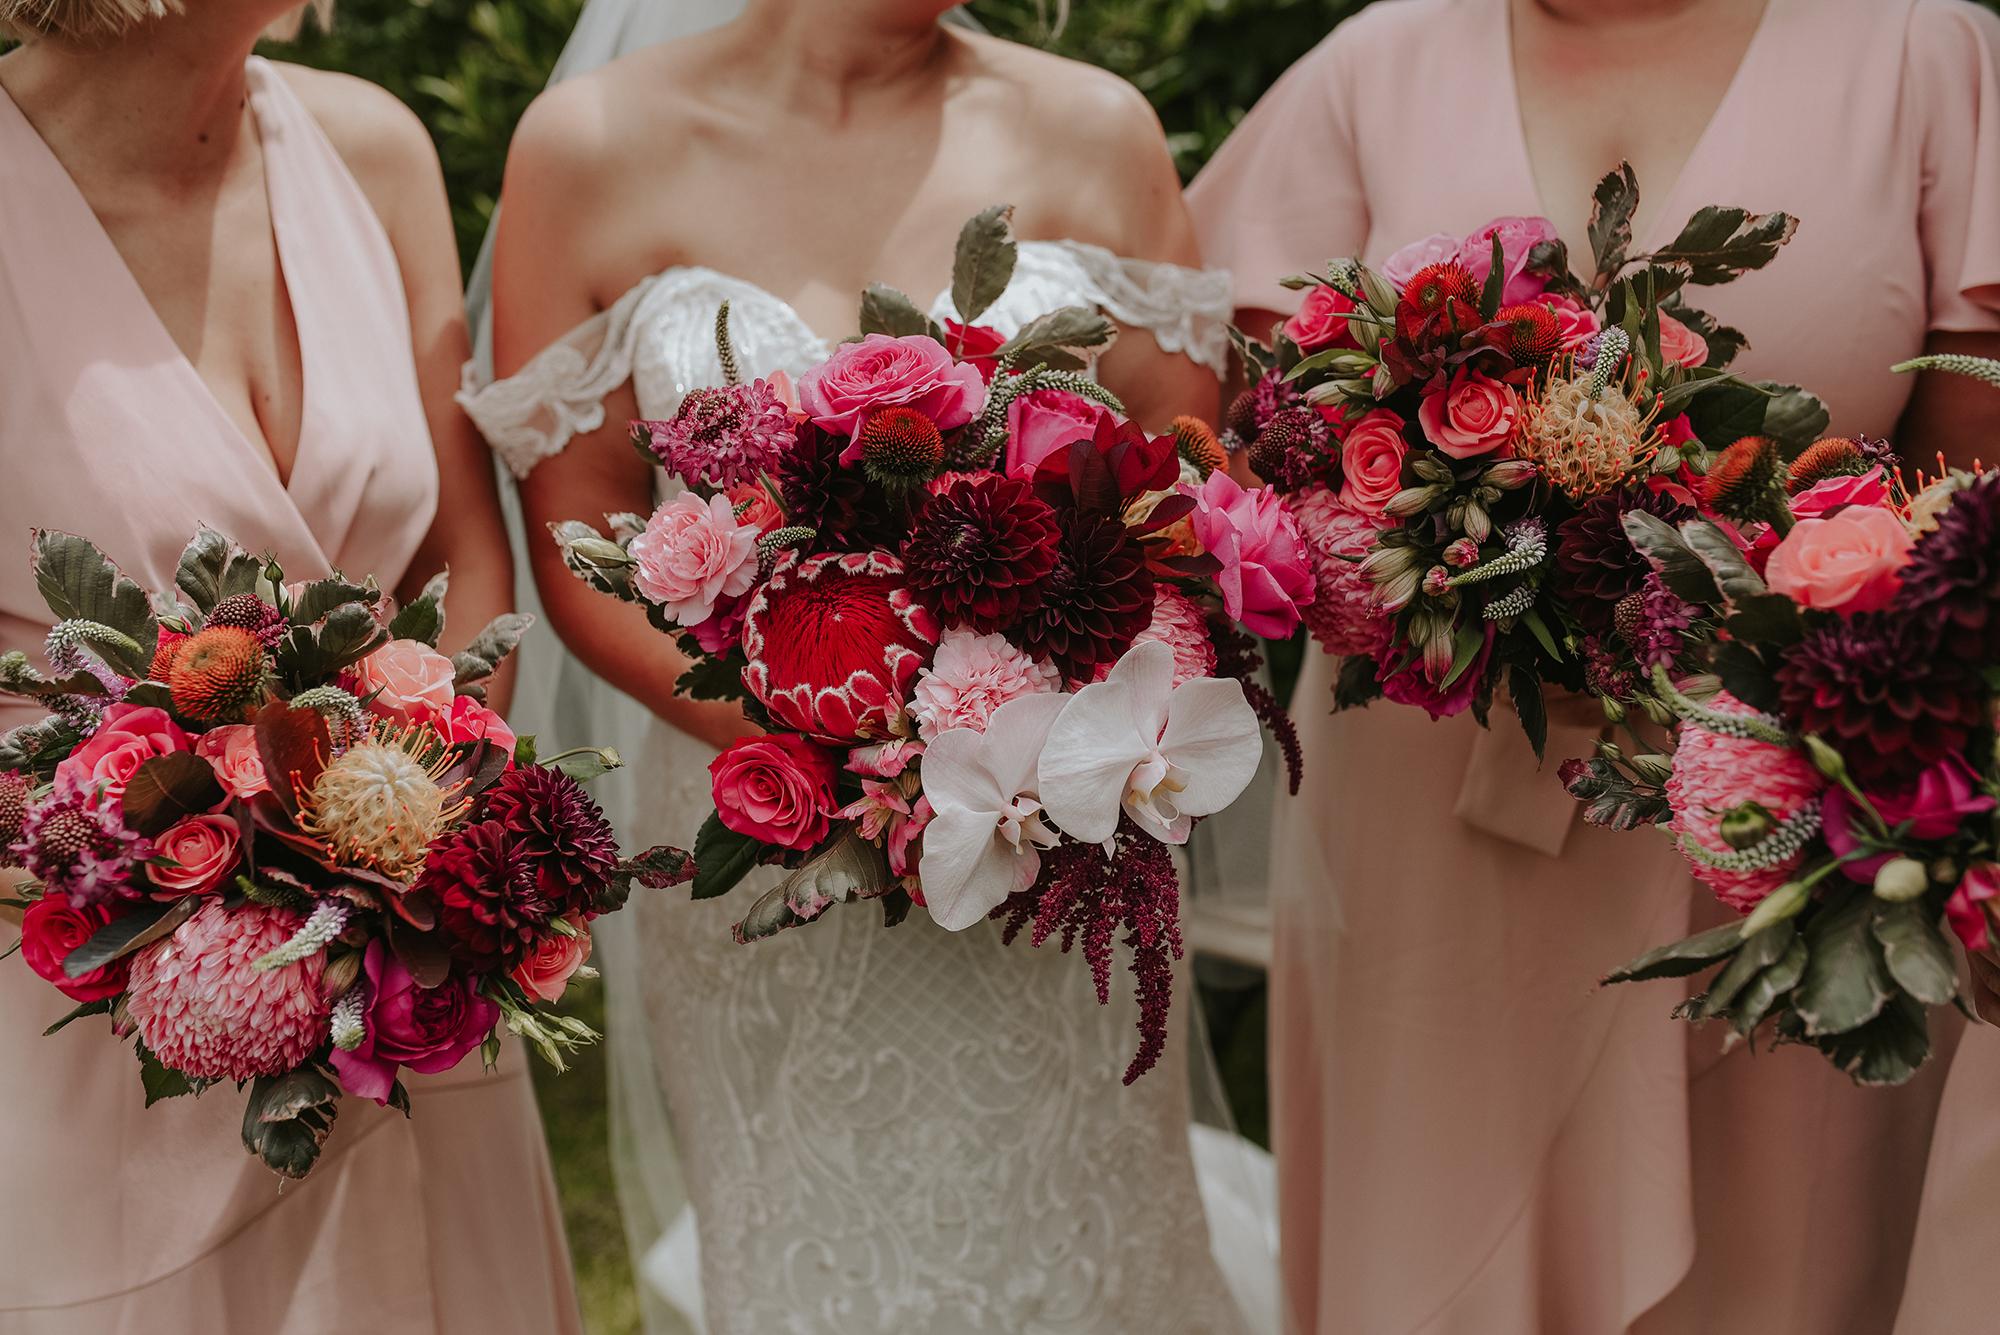 Smitten wedding photography (6)